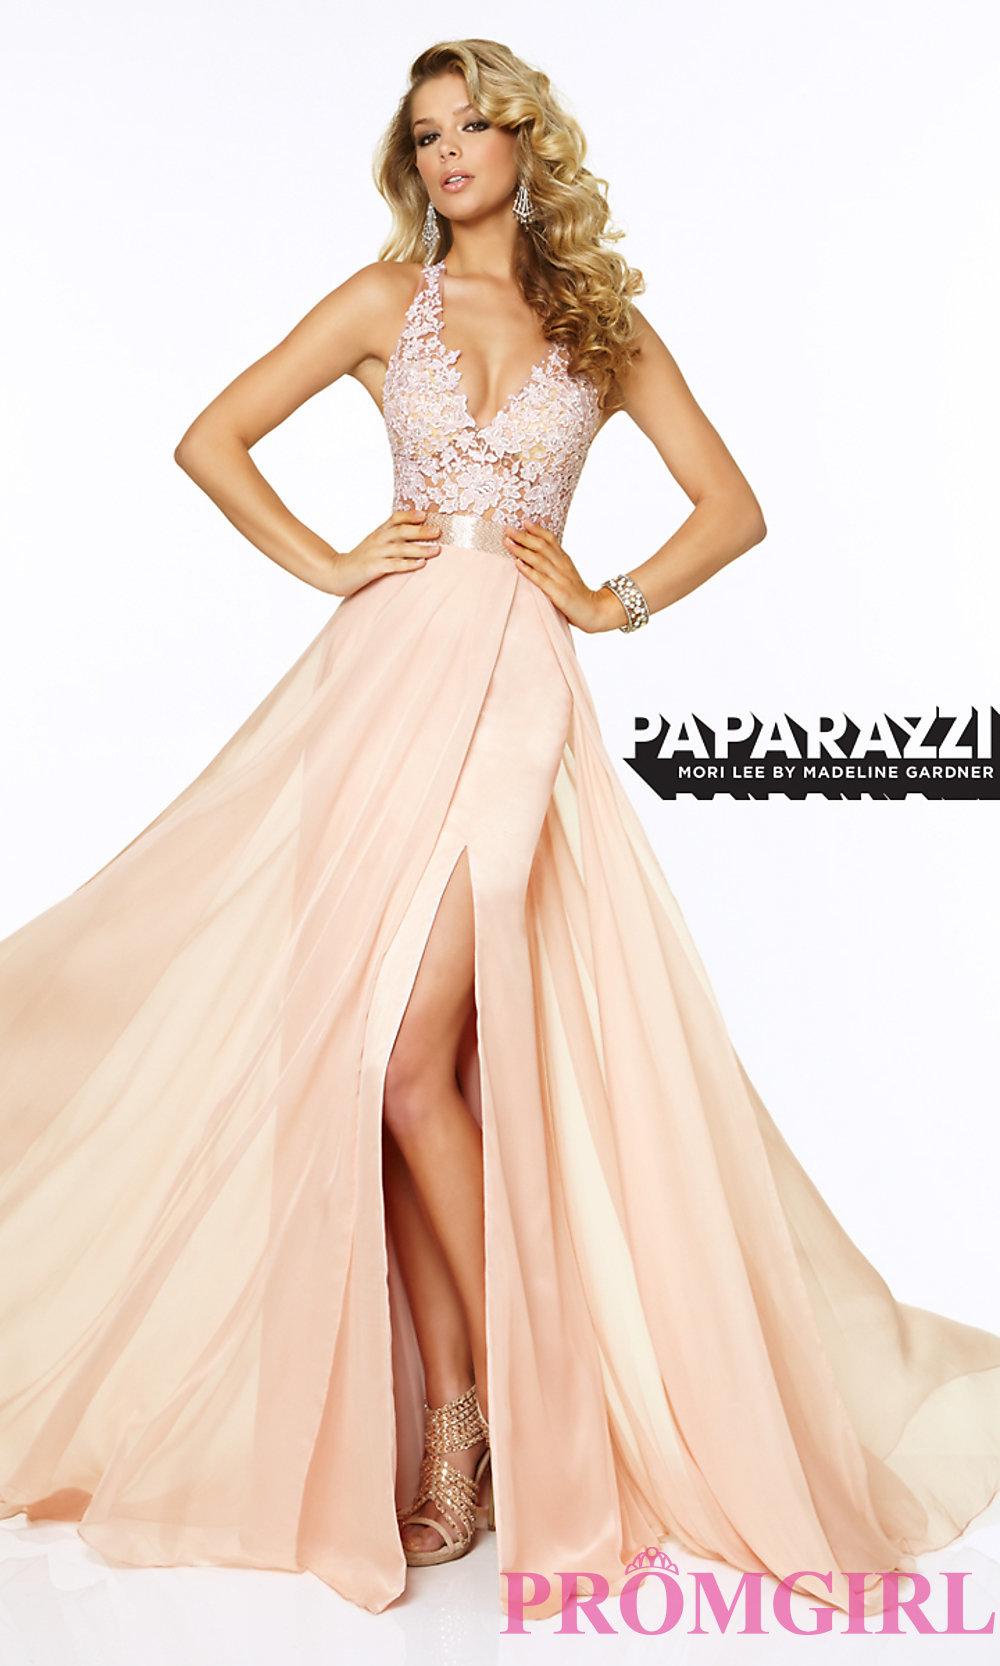 d22bf5b3f15 Long V-Neck Lace Prom Dress by Mori Lee ML-97018